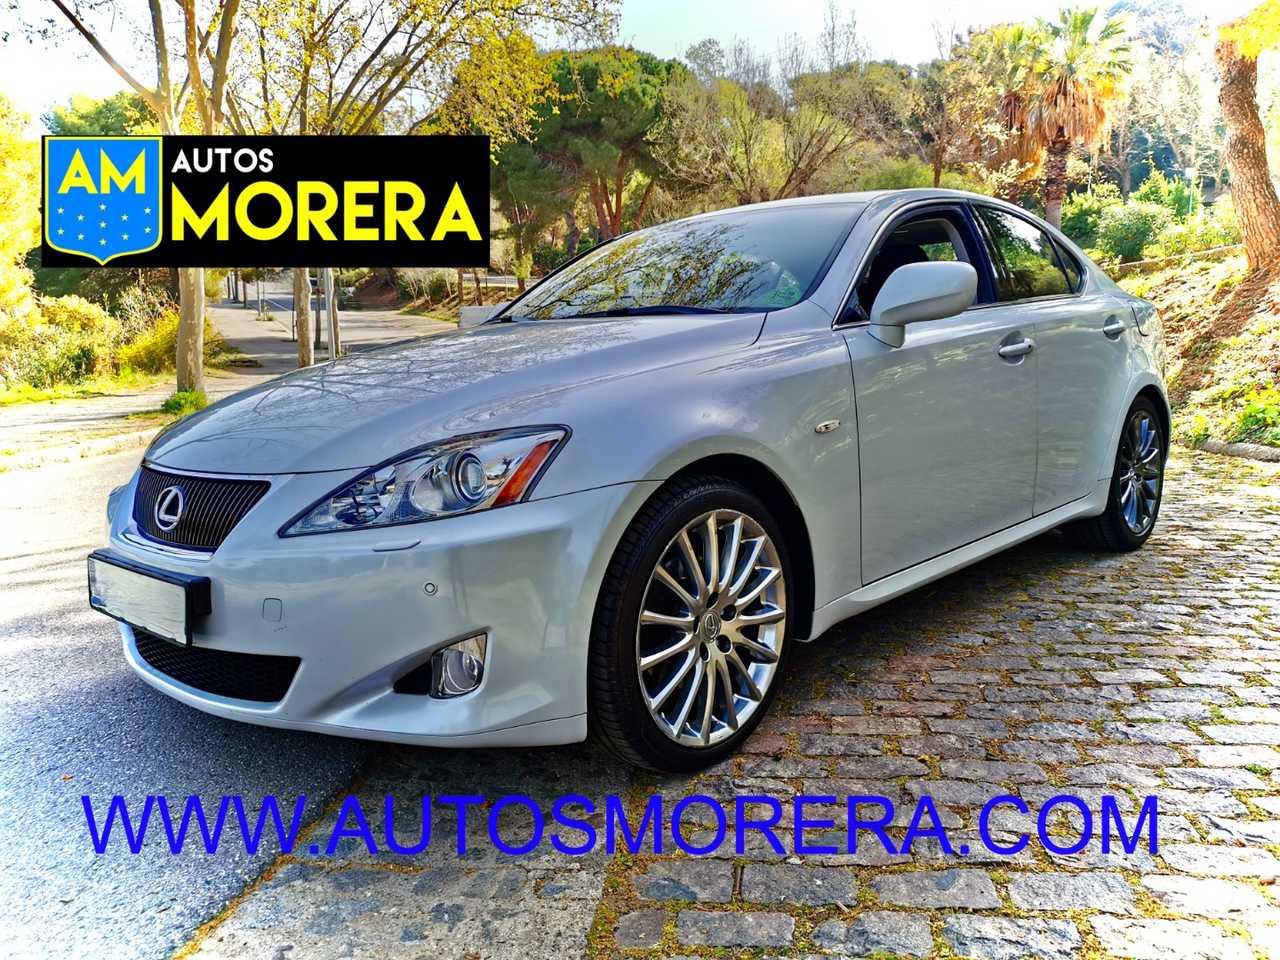 Lexus IS 250 President Sport 208cv. Pocos KM. IMPECABLE!!!   - Foto 1